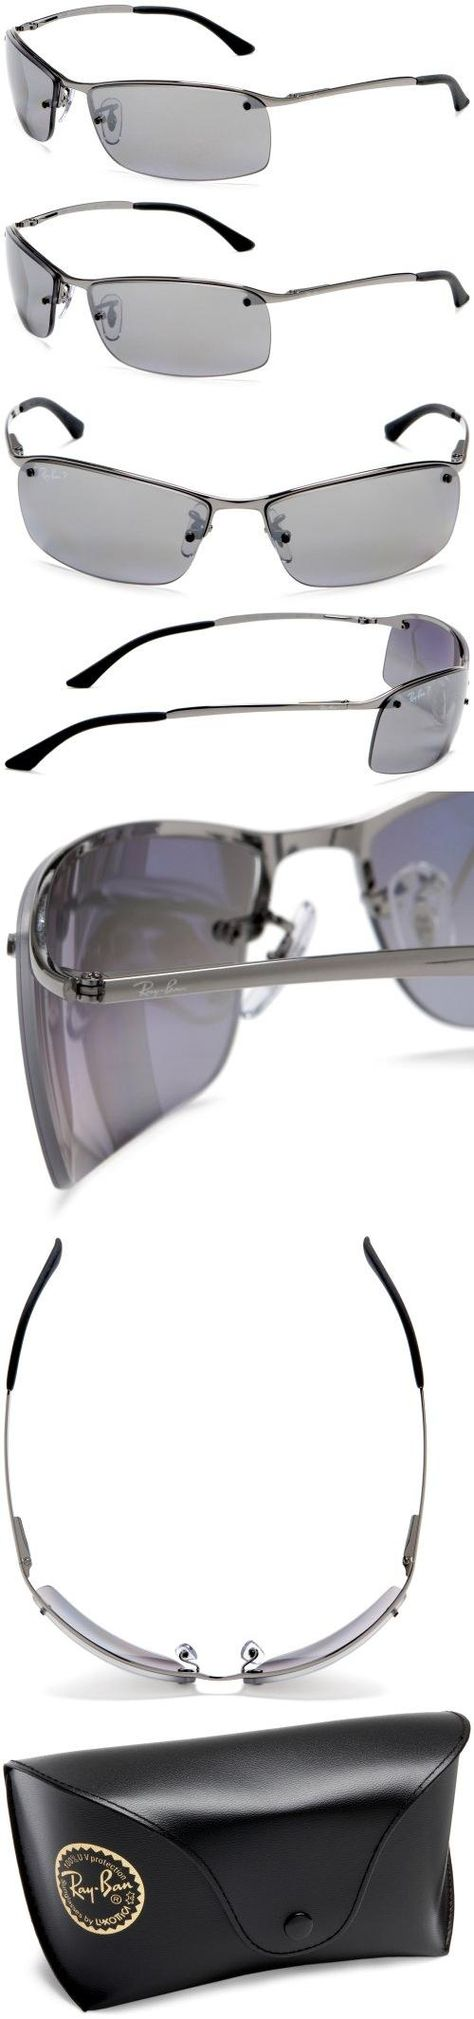 Ray-Ban RB3183 Sunglasses Polarized, Gunmetal/Polarized Smoke // http://www.ray-ban.com/spain/products/sun/RB3183